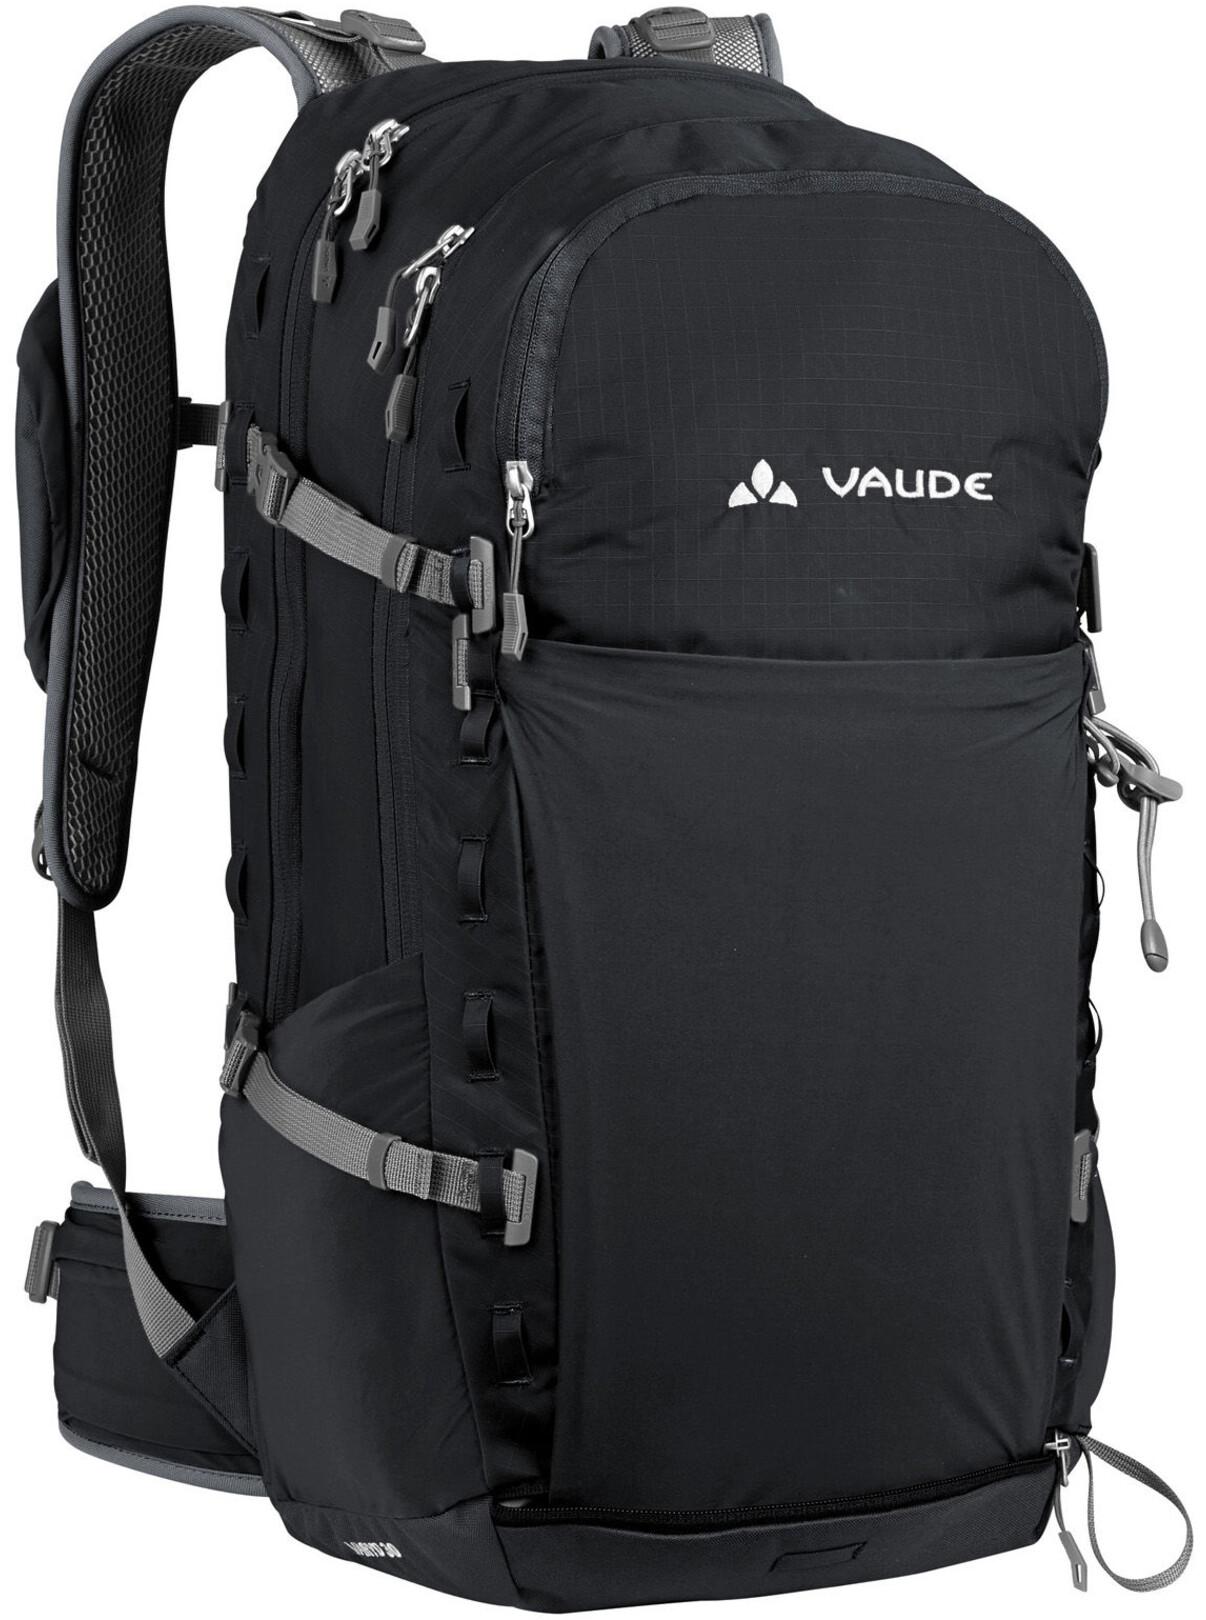 870e0b4e3f029 VAUDE Varyd 22 Backpack black at Addnature.co.uk